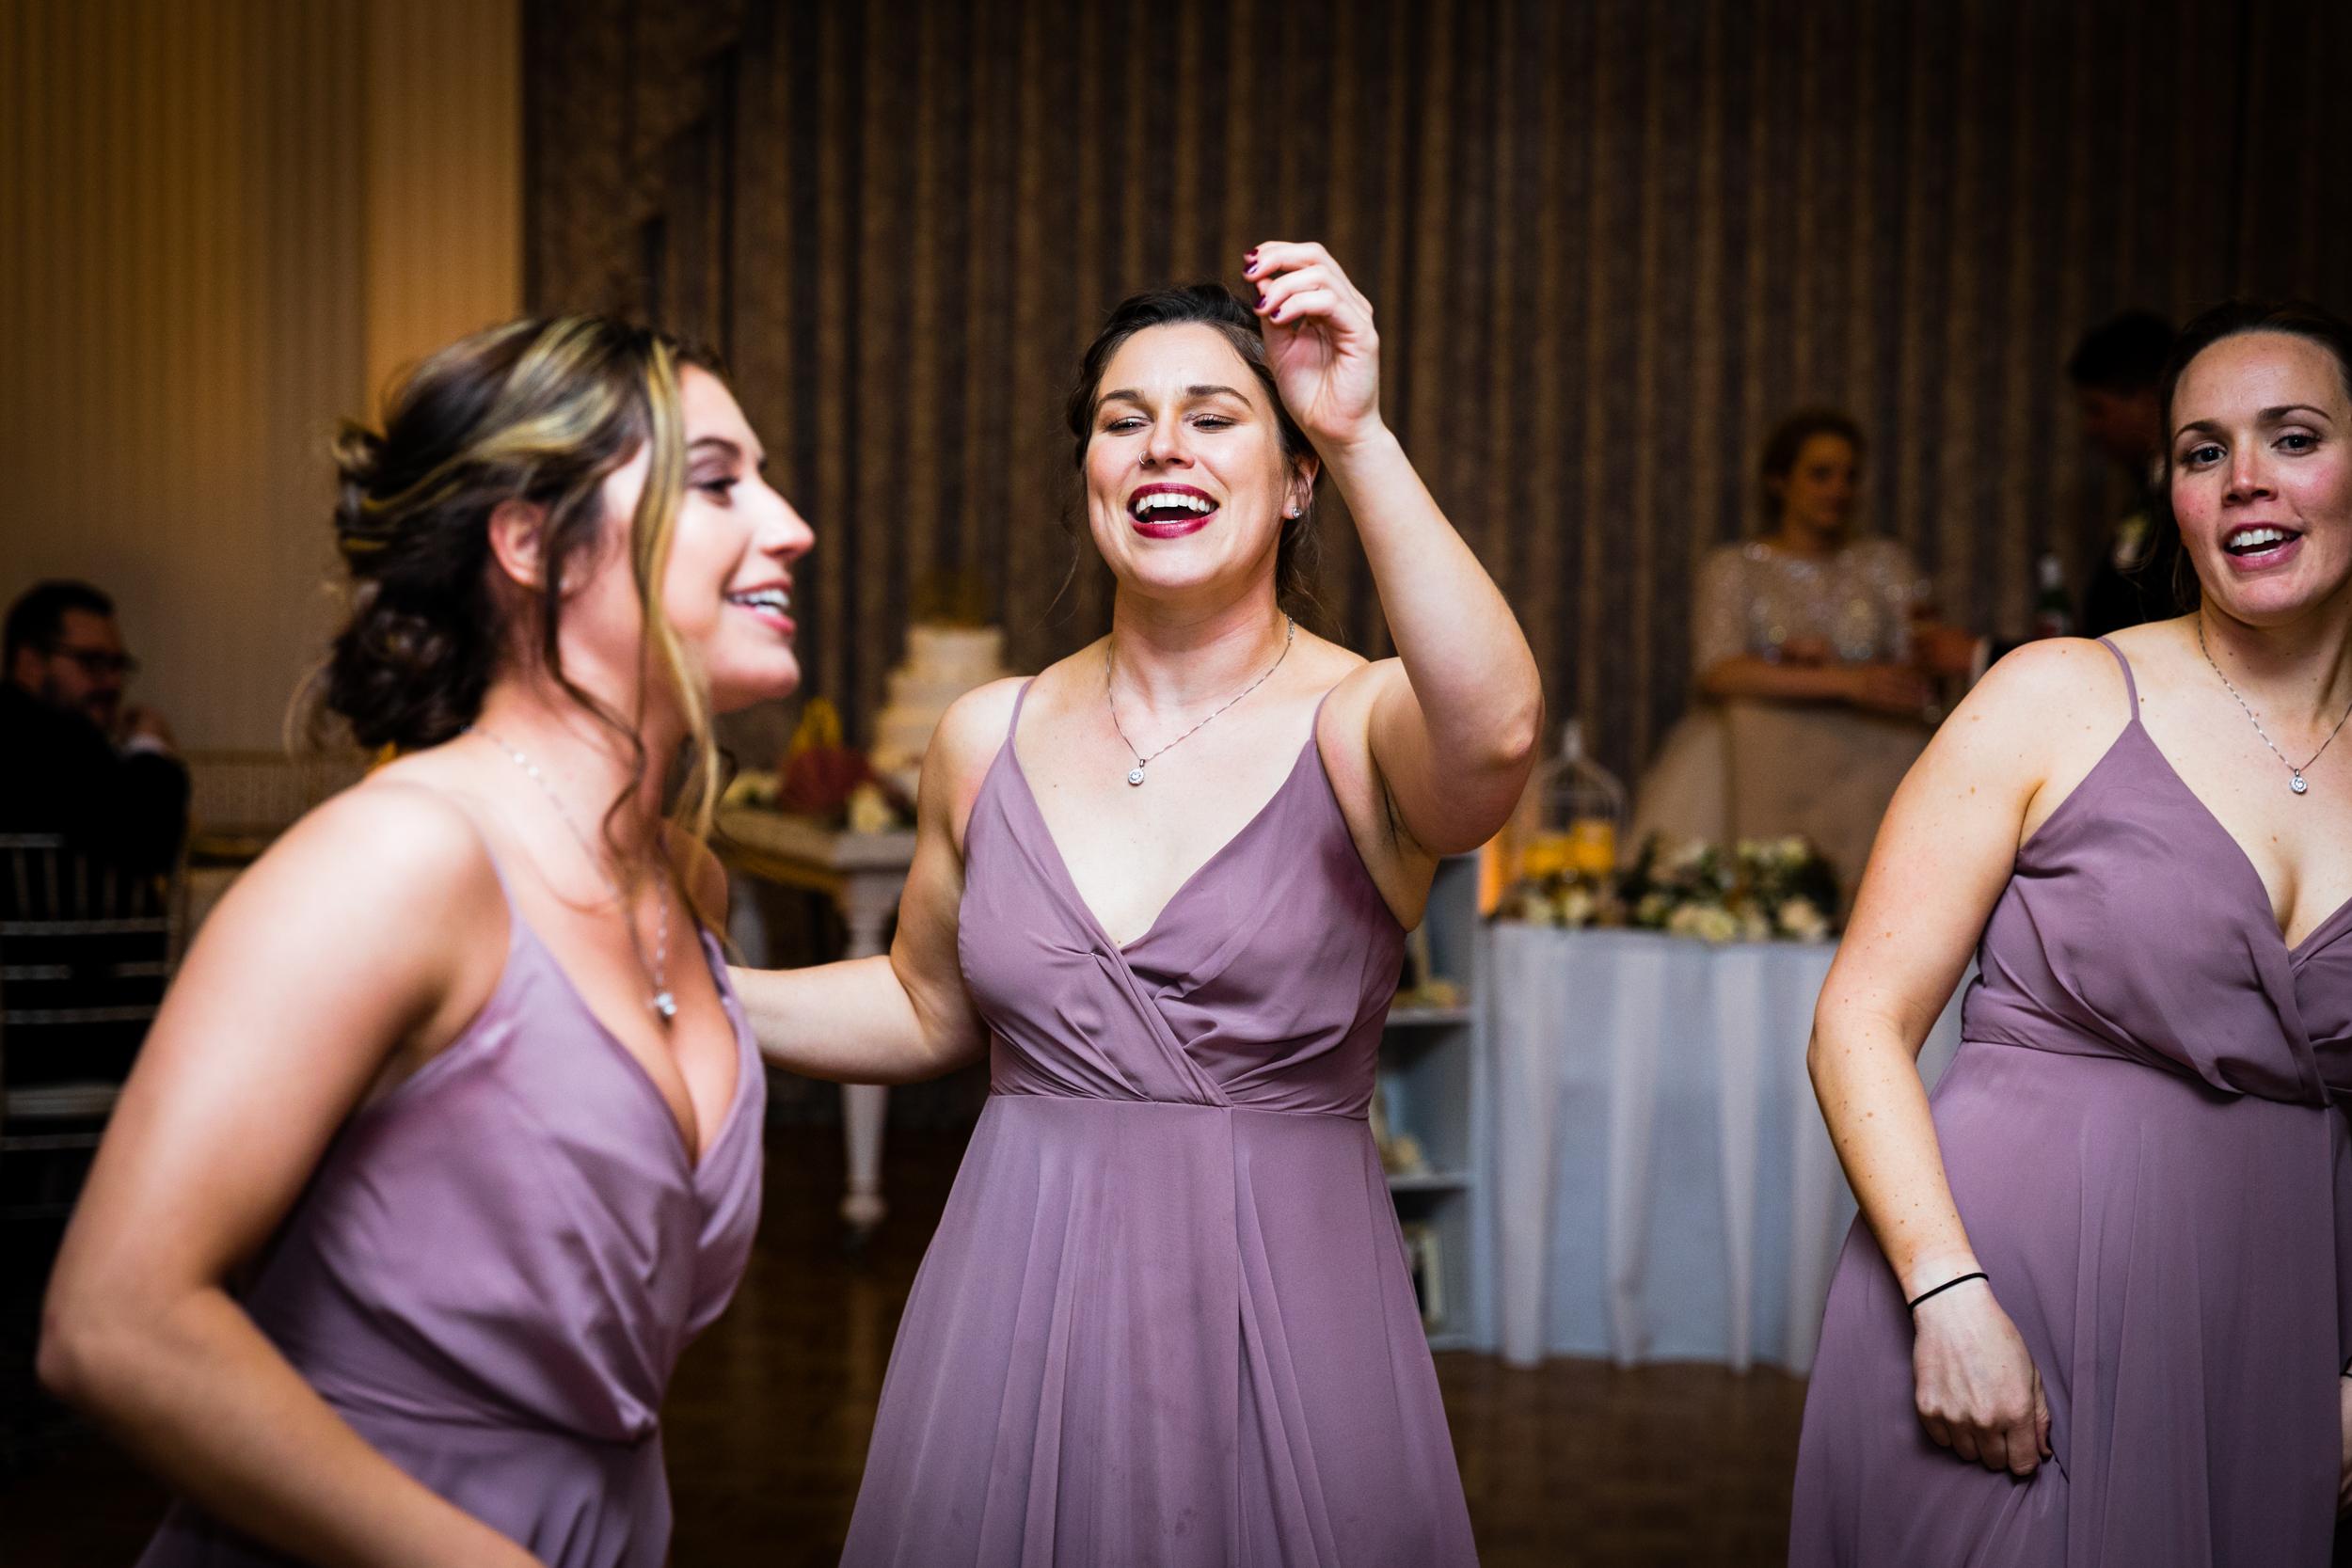 CELEBRATIONS BENSALEM WEDDING PHOTOGRAPHY-95.jpg